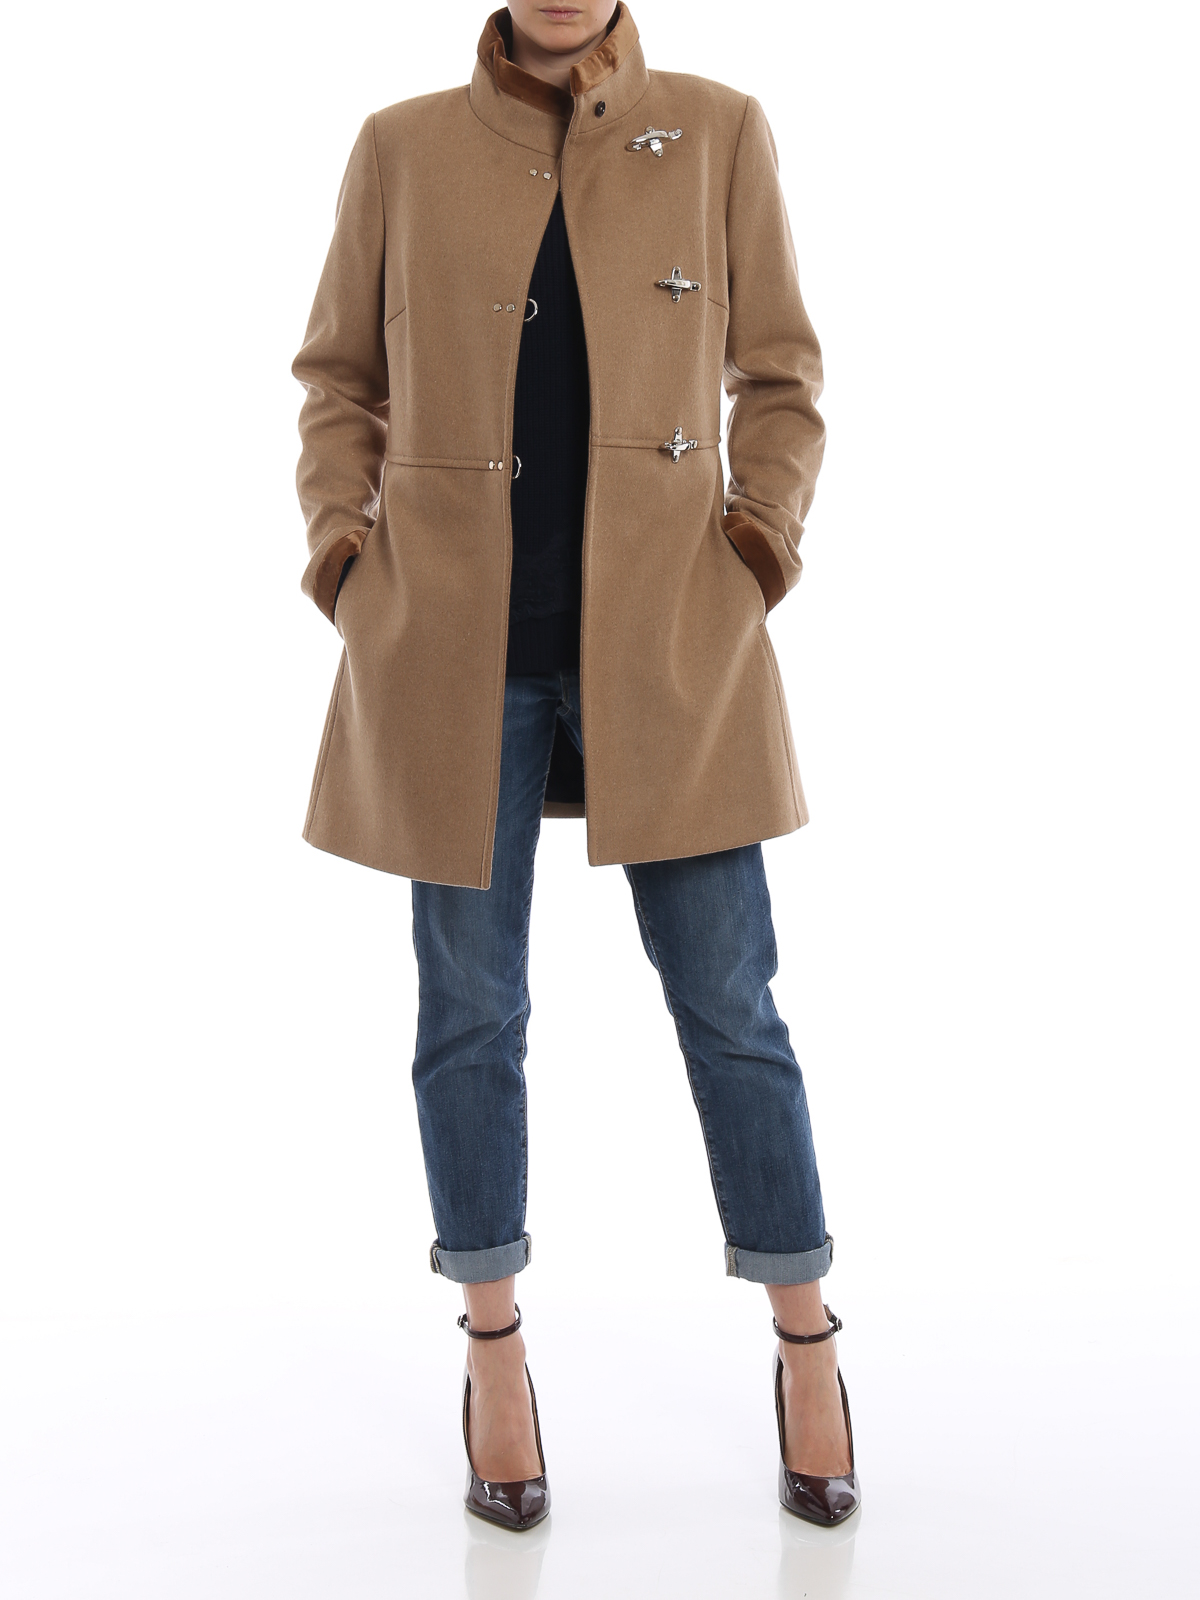 best sneakers 92b65 8b835 Fay - Cappotto Virginia in lana e cashmere cammello ...